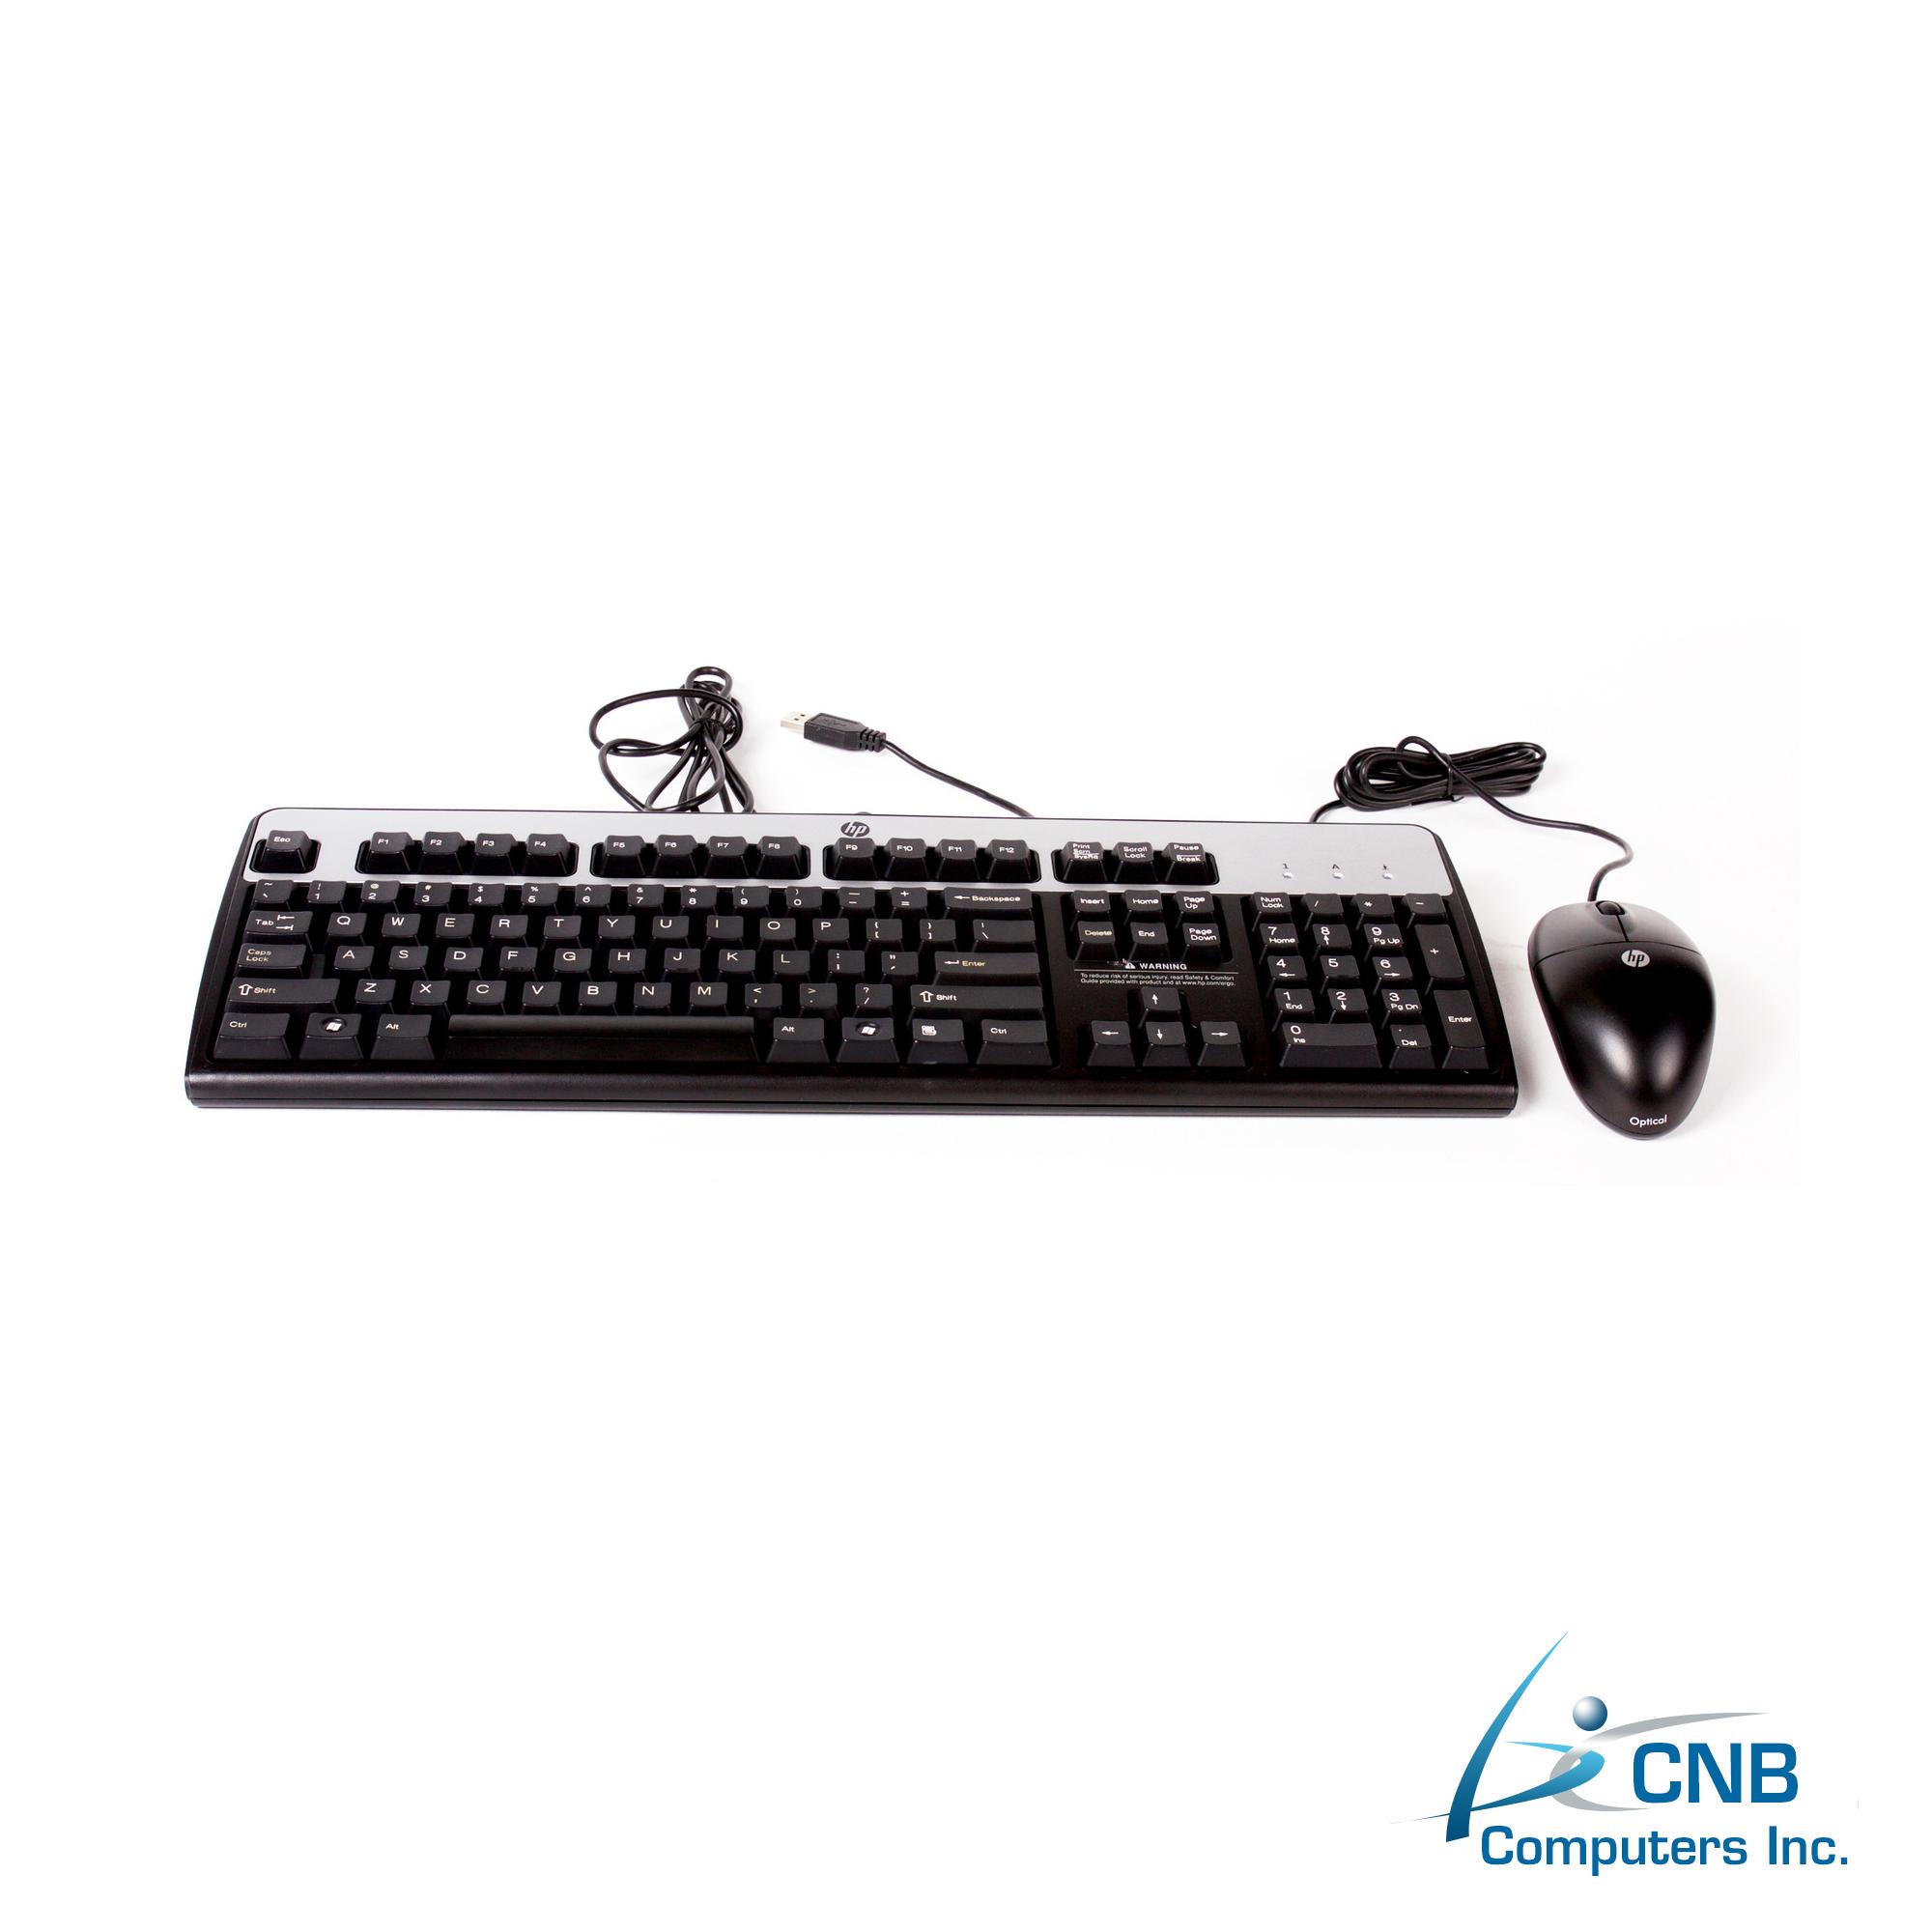 HP 8100 ELITE DESKTOP, 4GB, 500GB HDD, INTEL CORE i5 2 90GHz | CNB